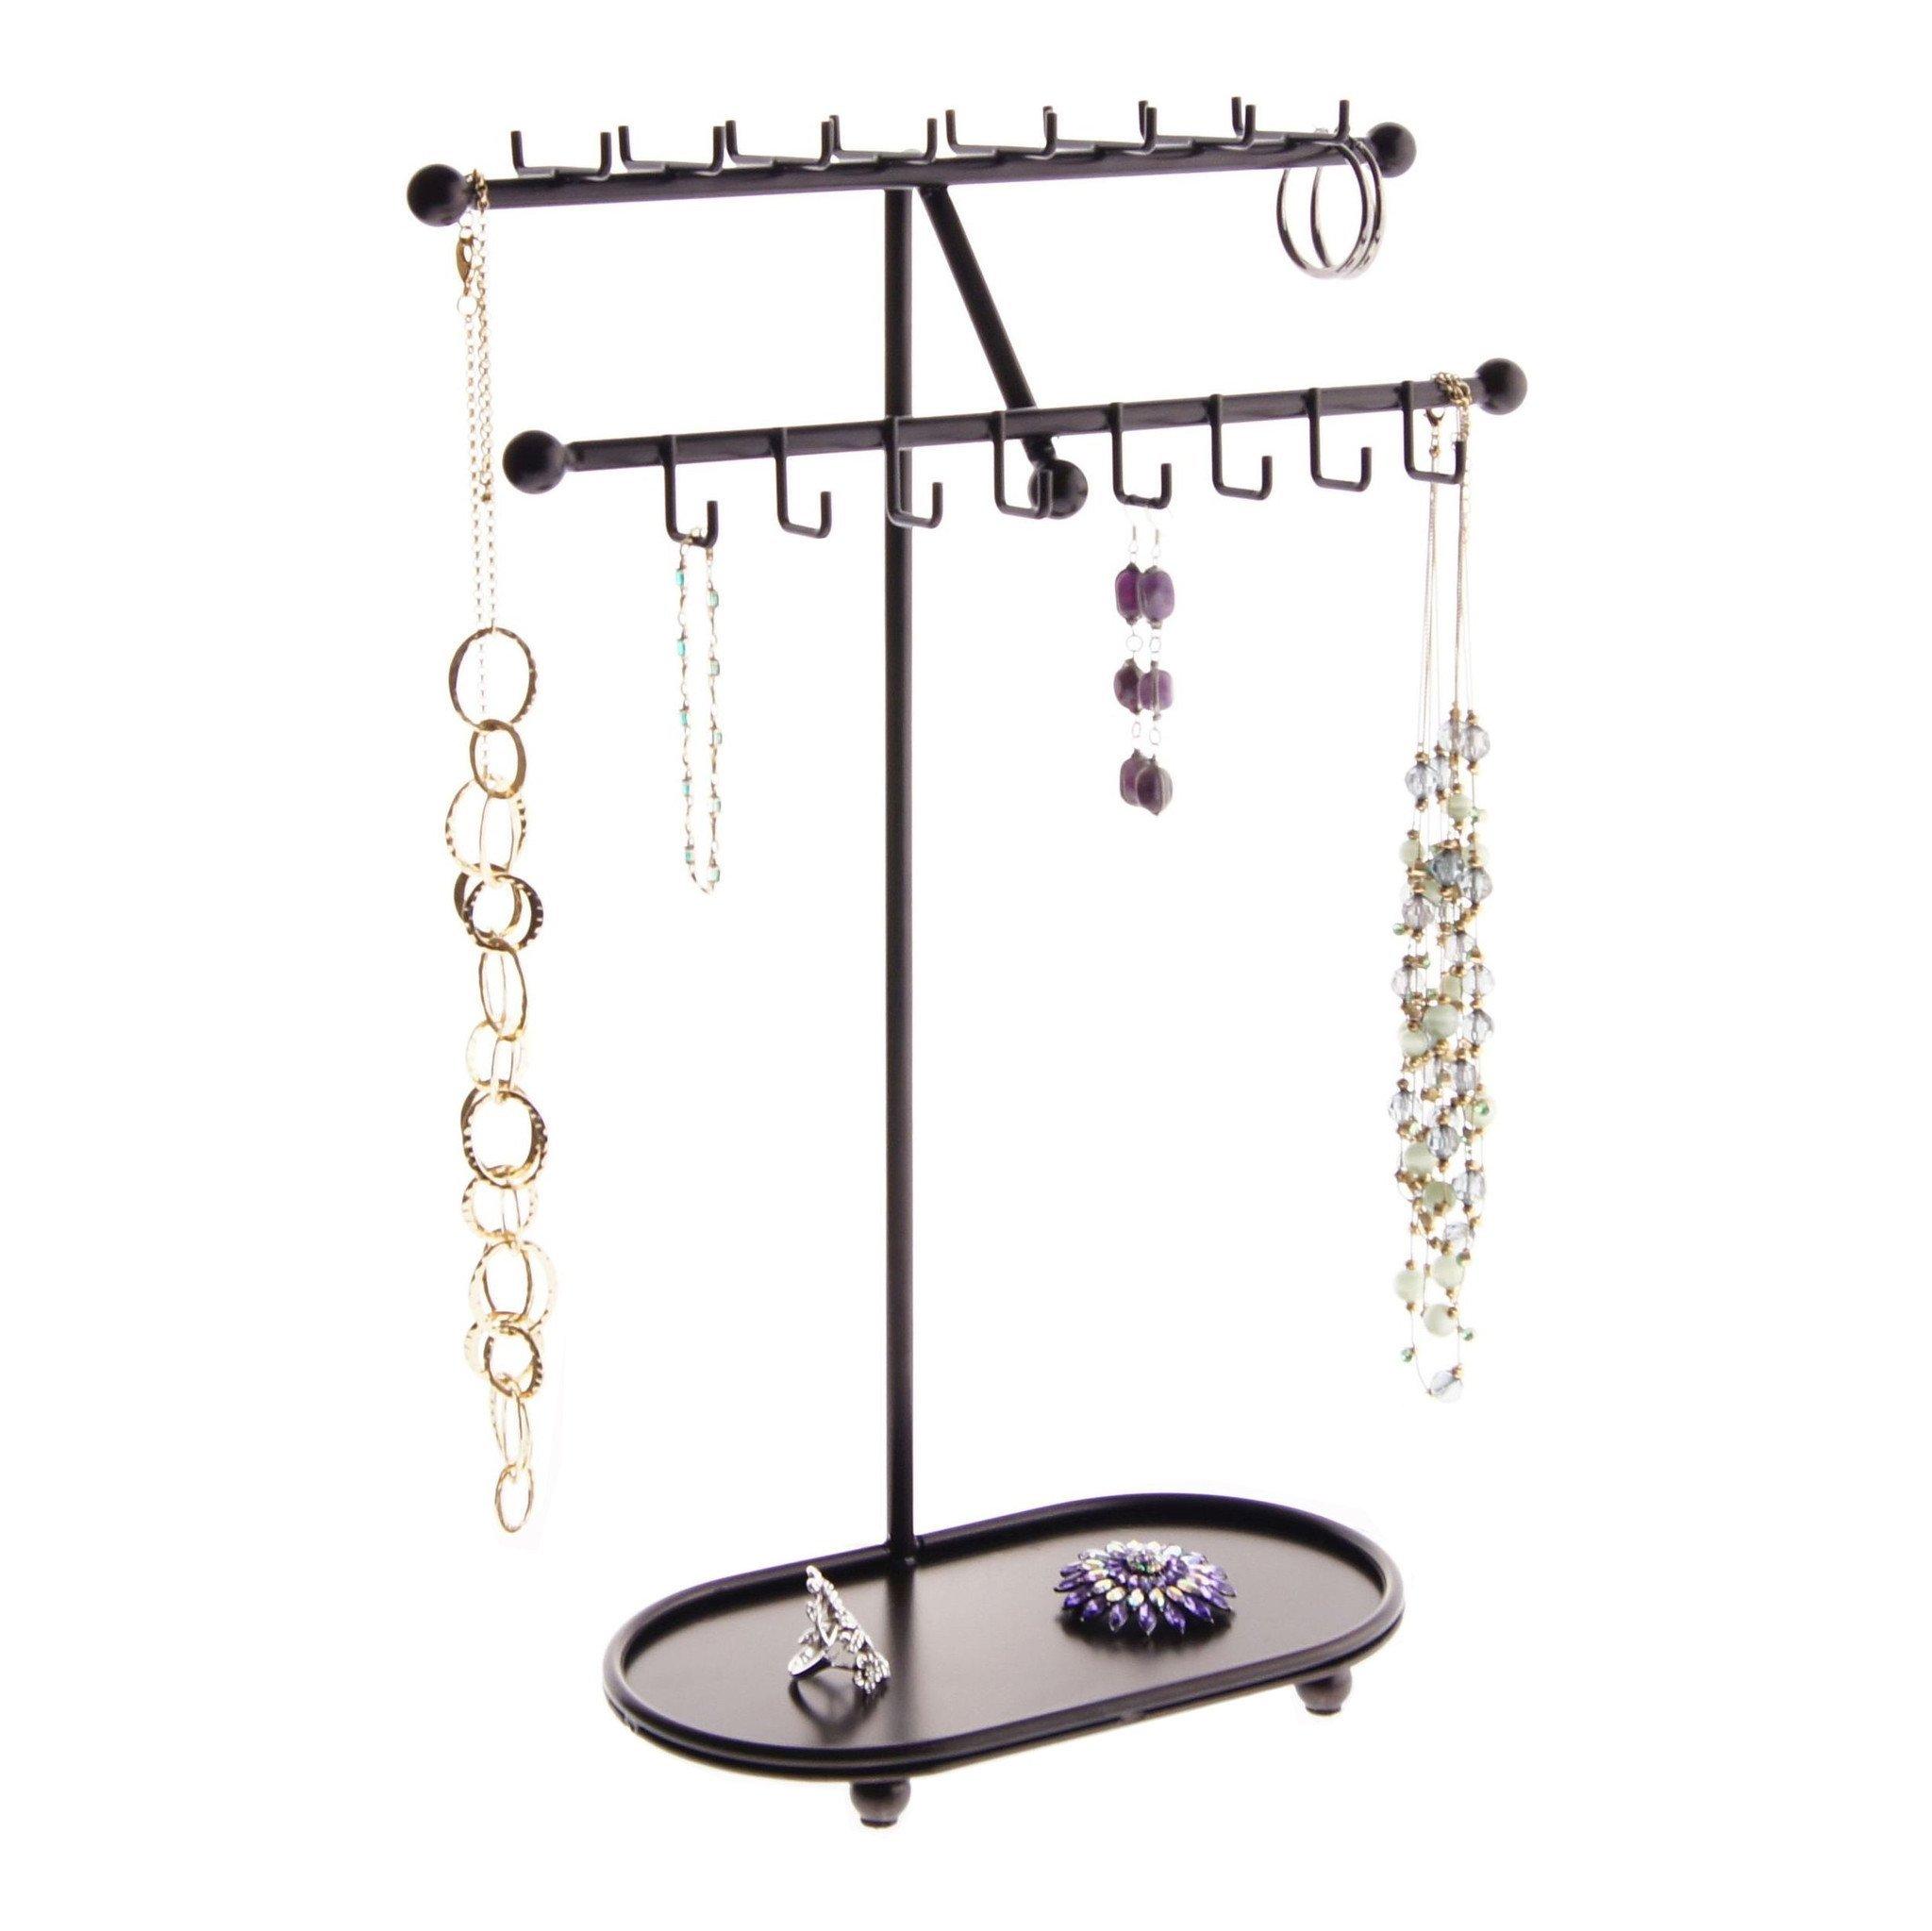 Angelynn's Necklace Holder Organizer Jewelry Tree Stand Storage Rack, Sharisa Rubbed Bronze